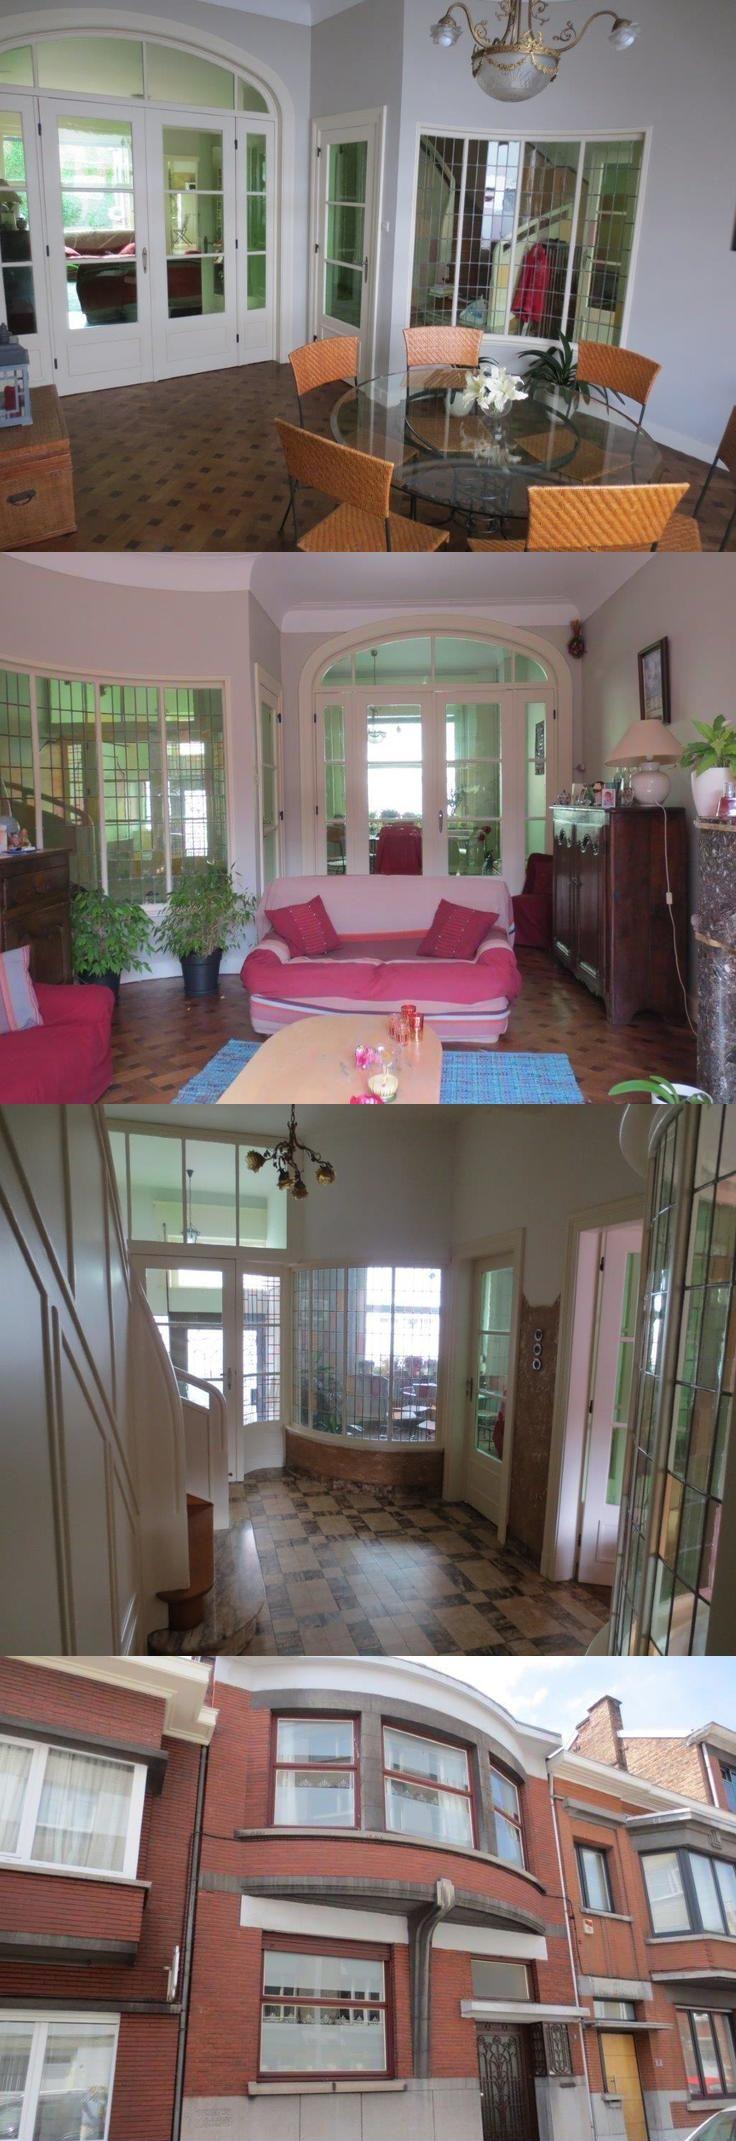 Maison  à vendre - Liège Victor Raskin 199 000